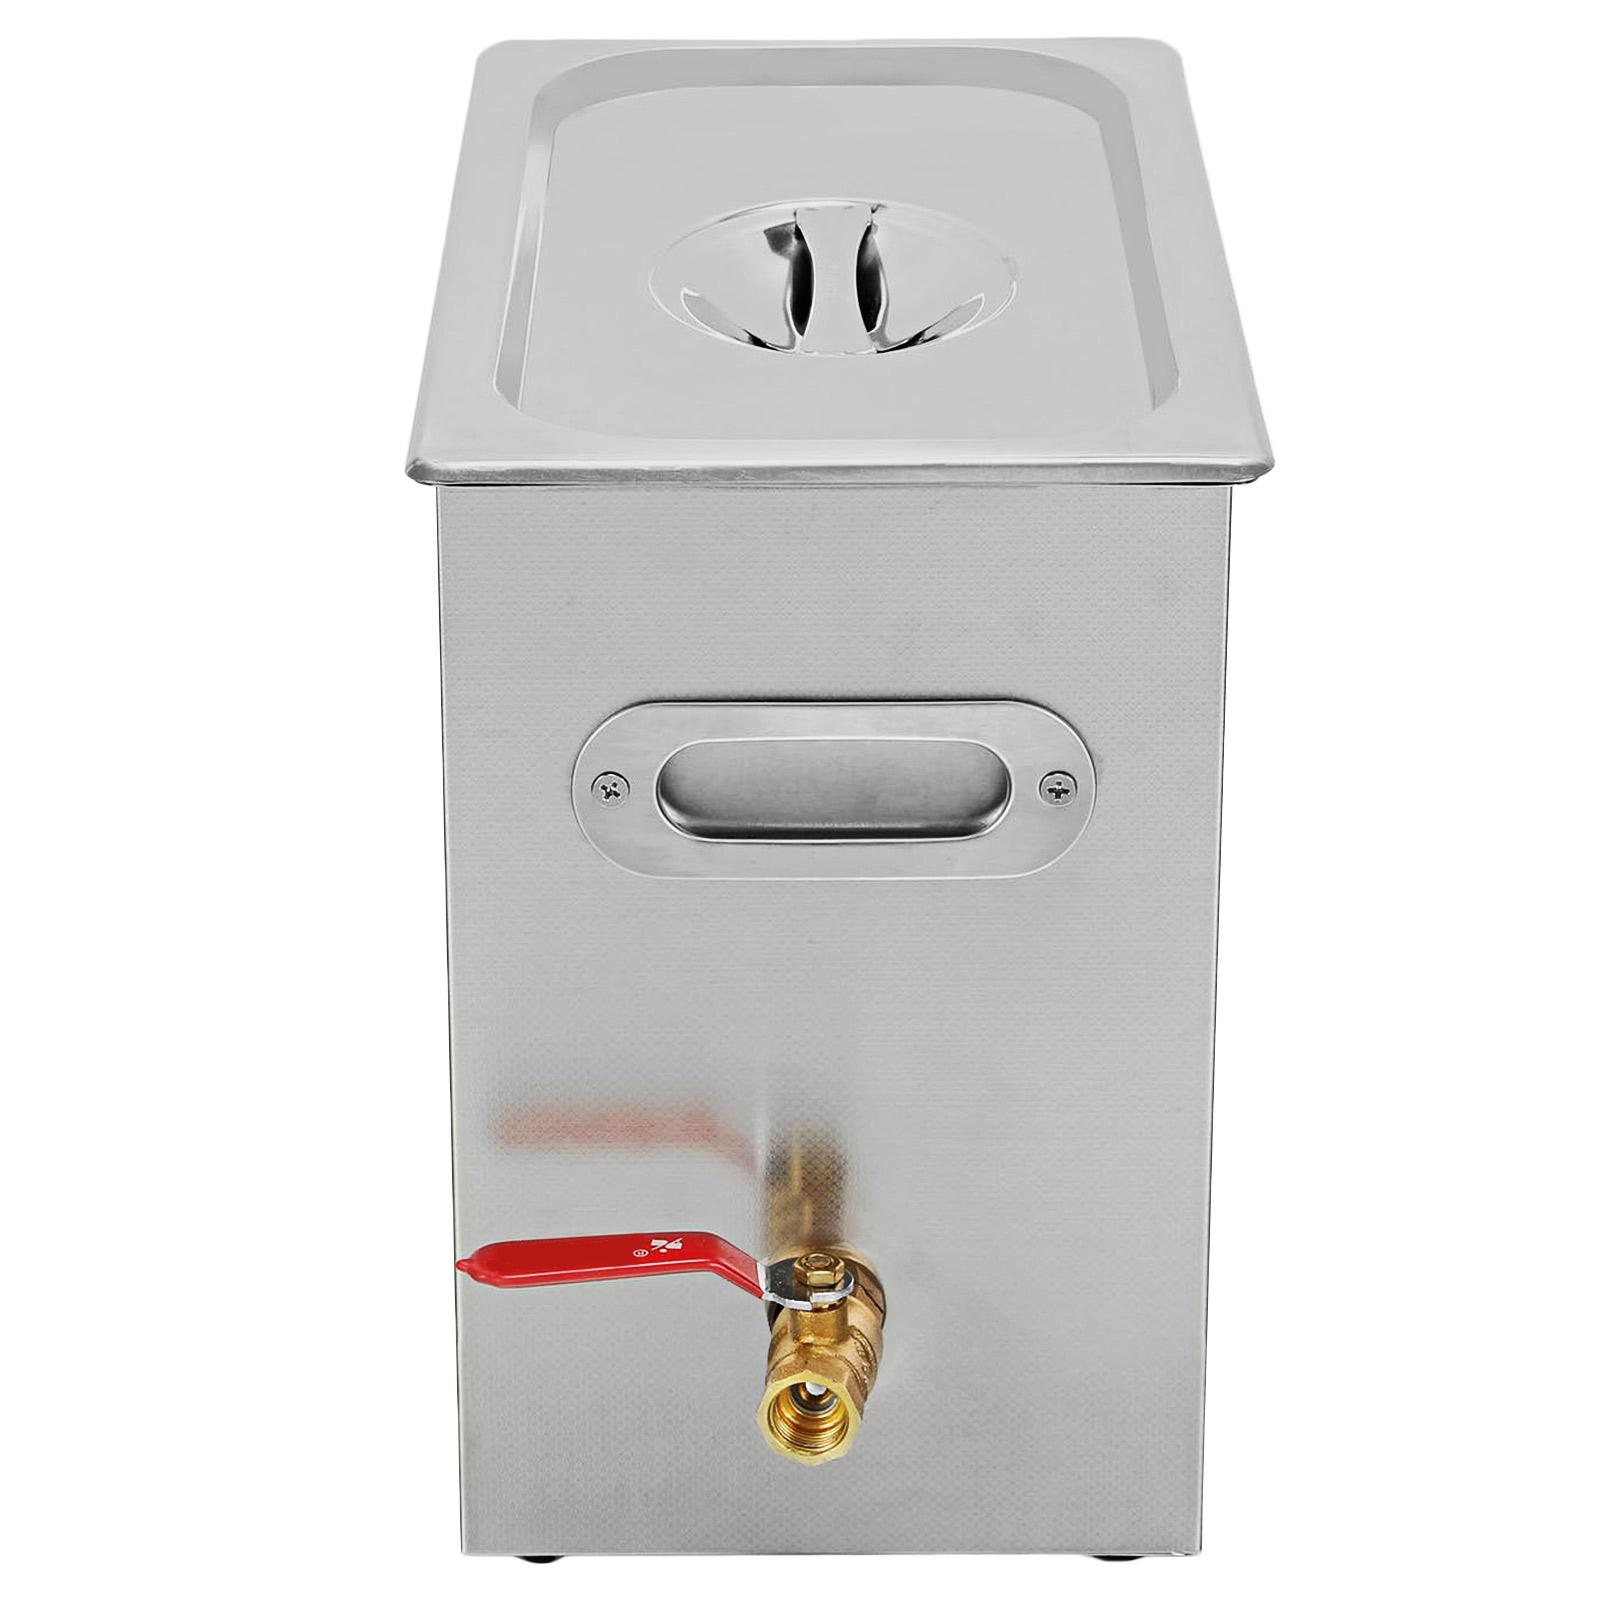 Vaschetta-Vasca-Ultrasuoni-Lavatrice-Pulitore-Ad-Ultrasuoni miniatura 52